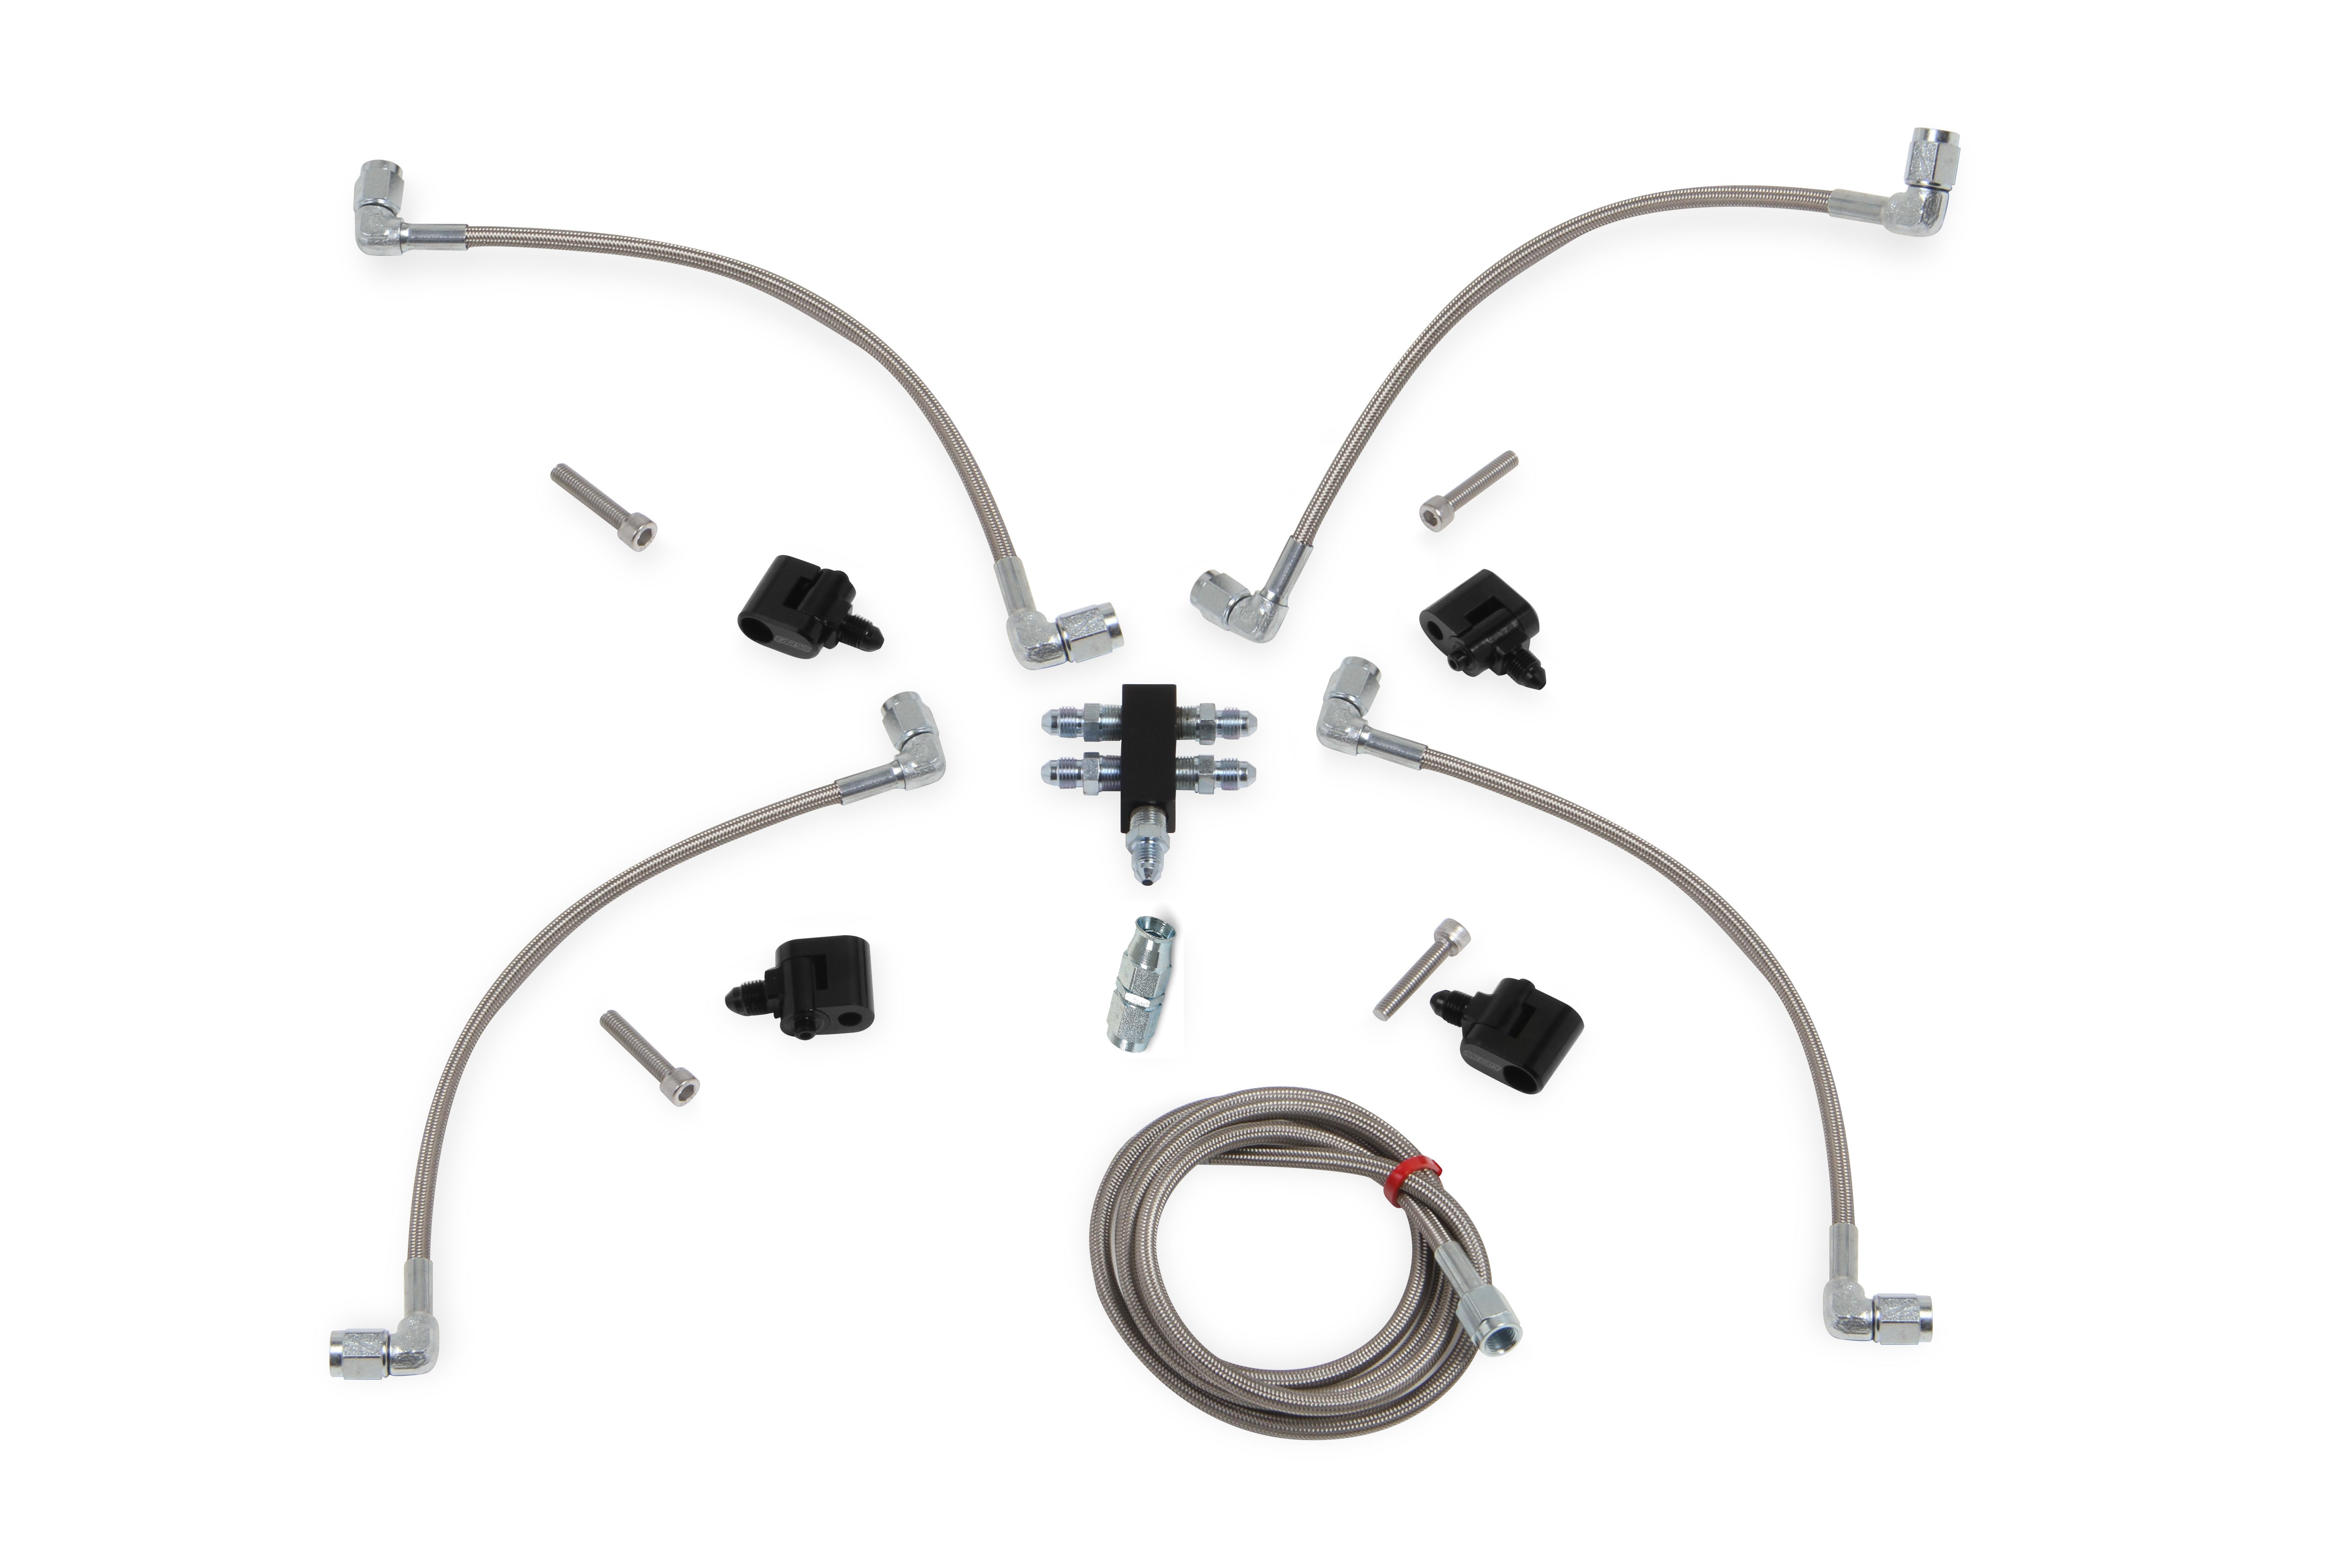 ls fuel filter kit